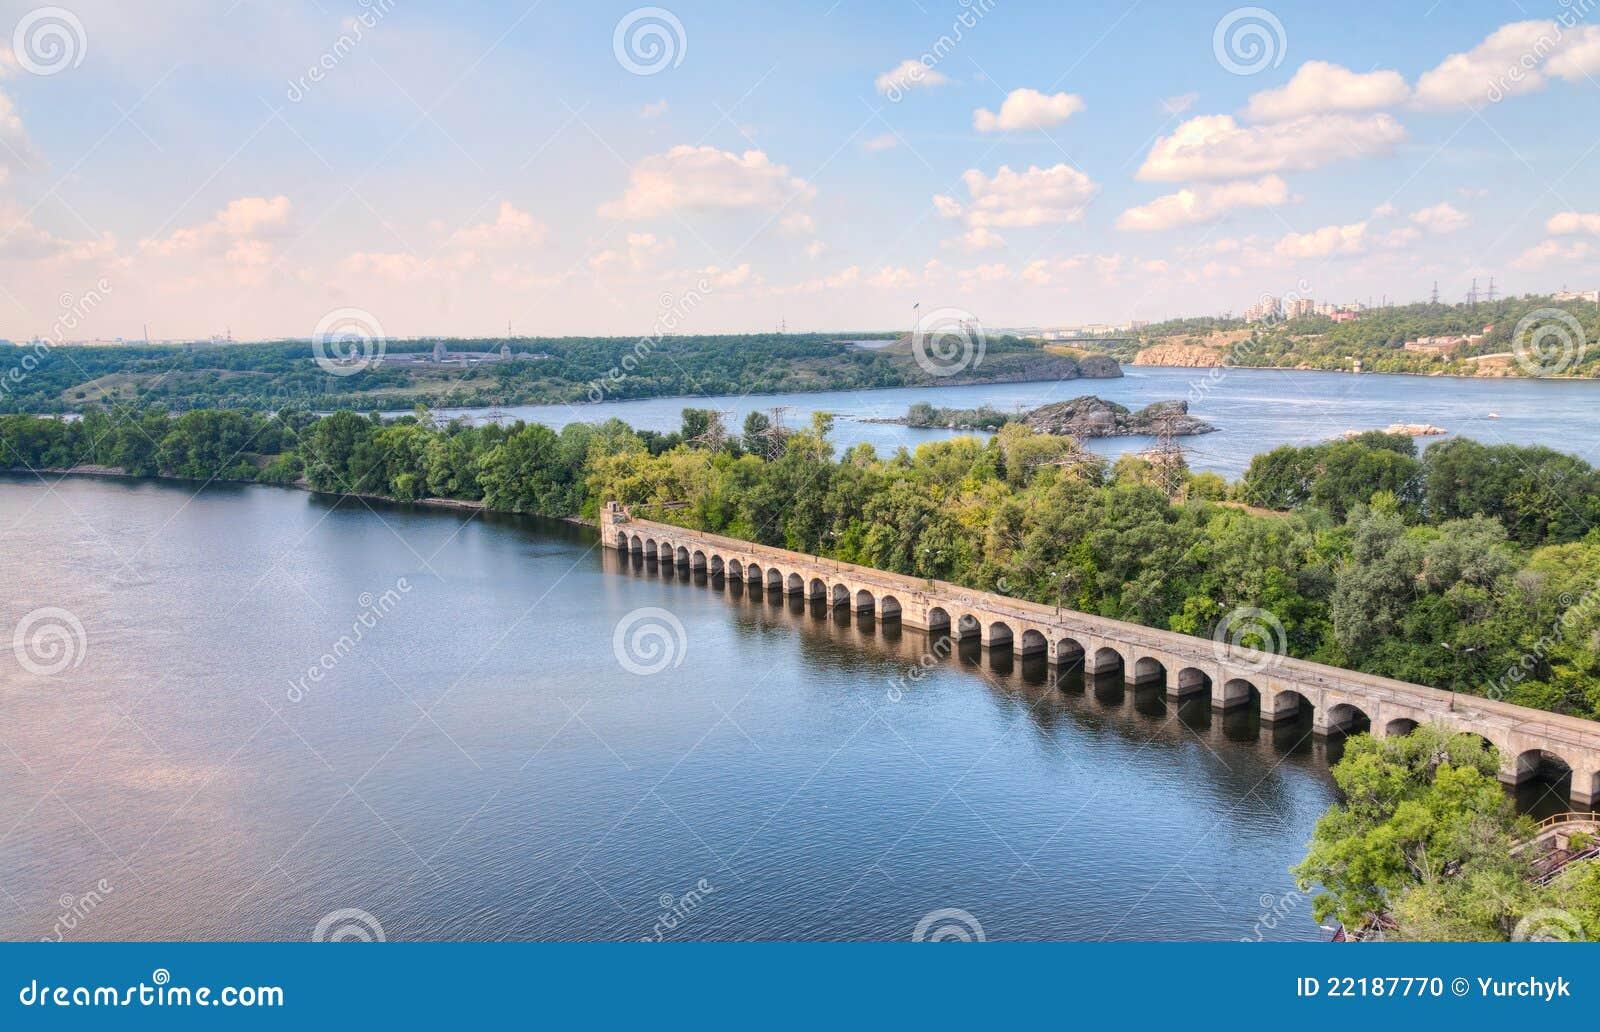 Dnieper river near zaporozhye city, ukraine